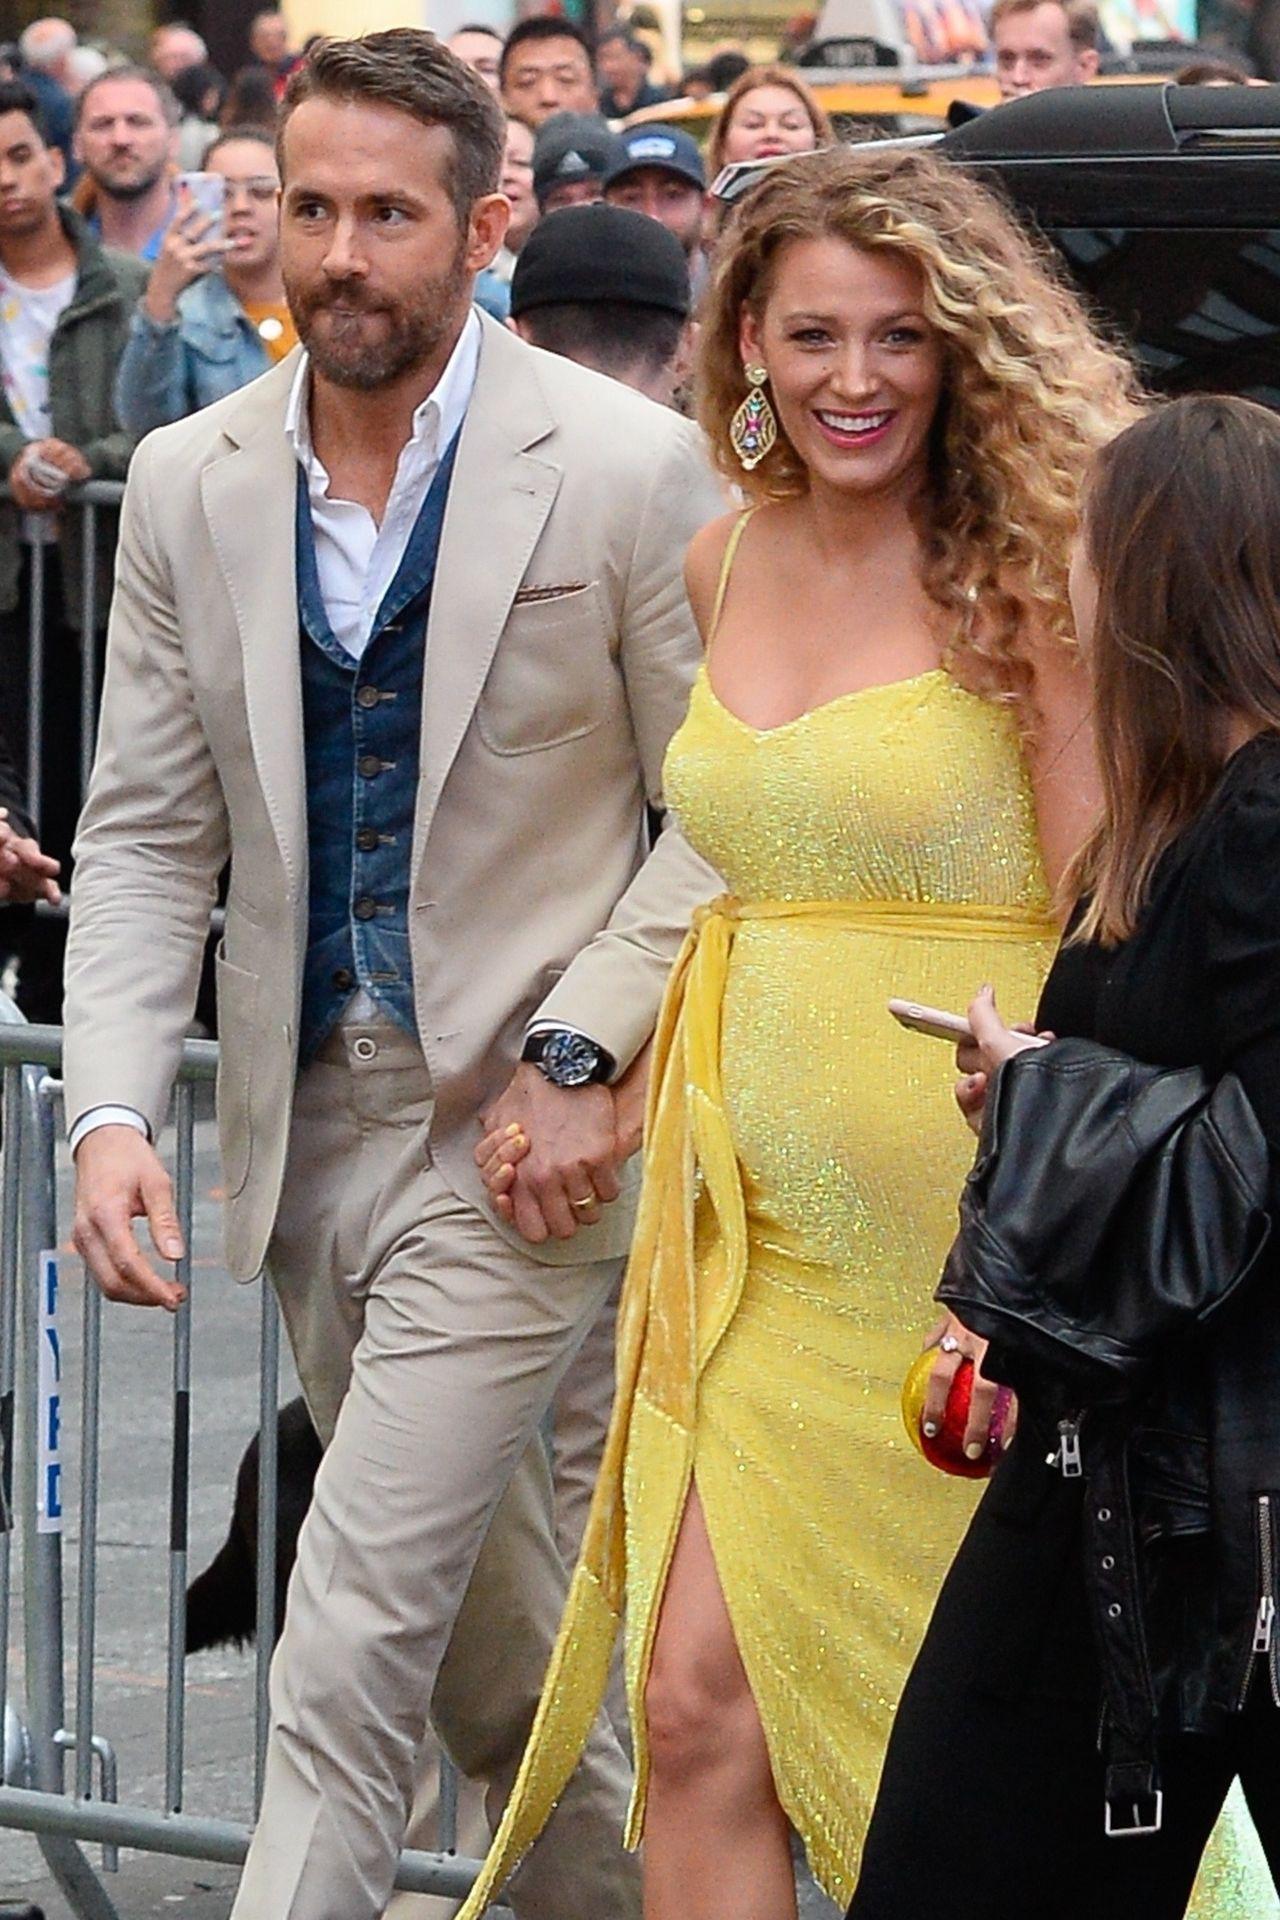 Pregnant Blake Lively and Ryan Reynolds arrive at the premiere of 'Pokemon' Blake Lively, Ryan Reynolds